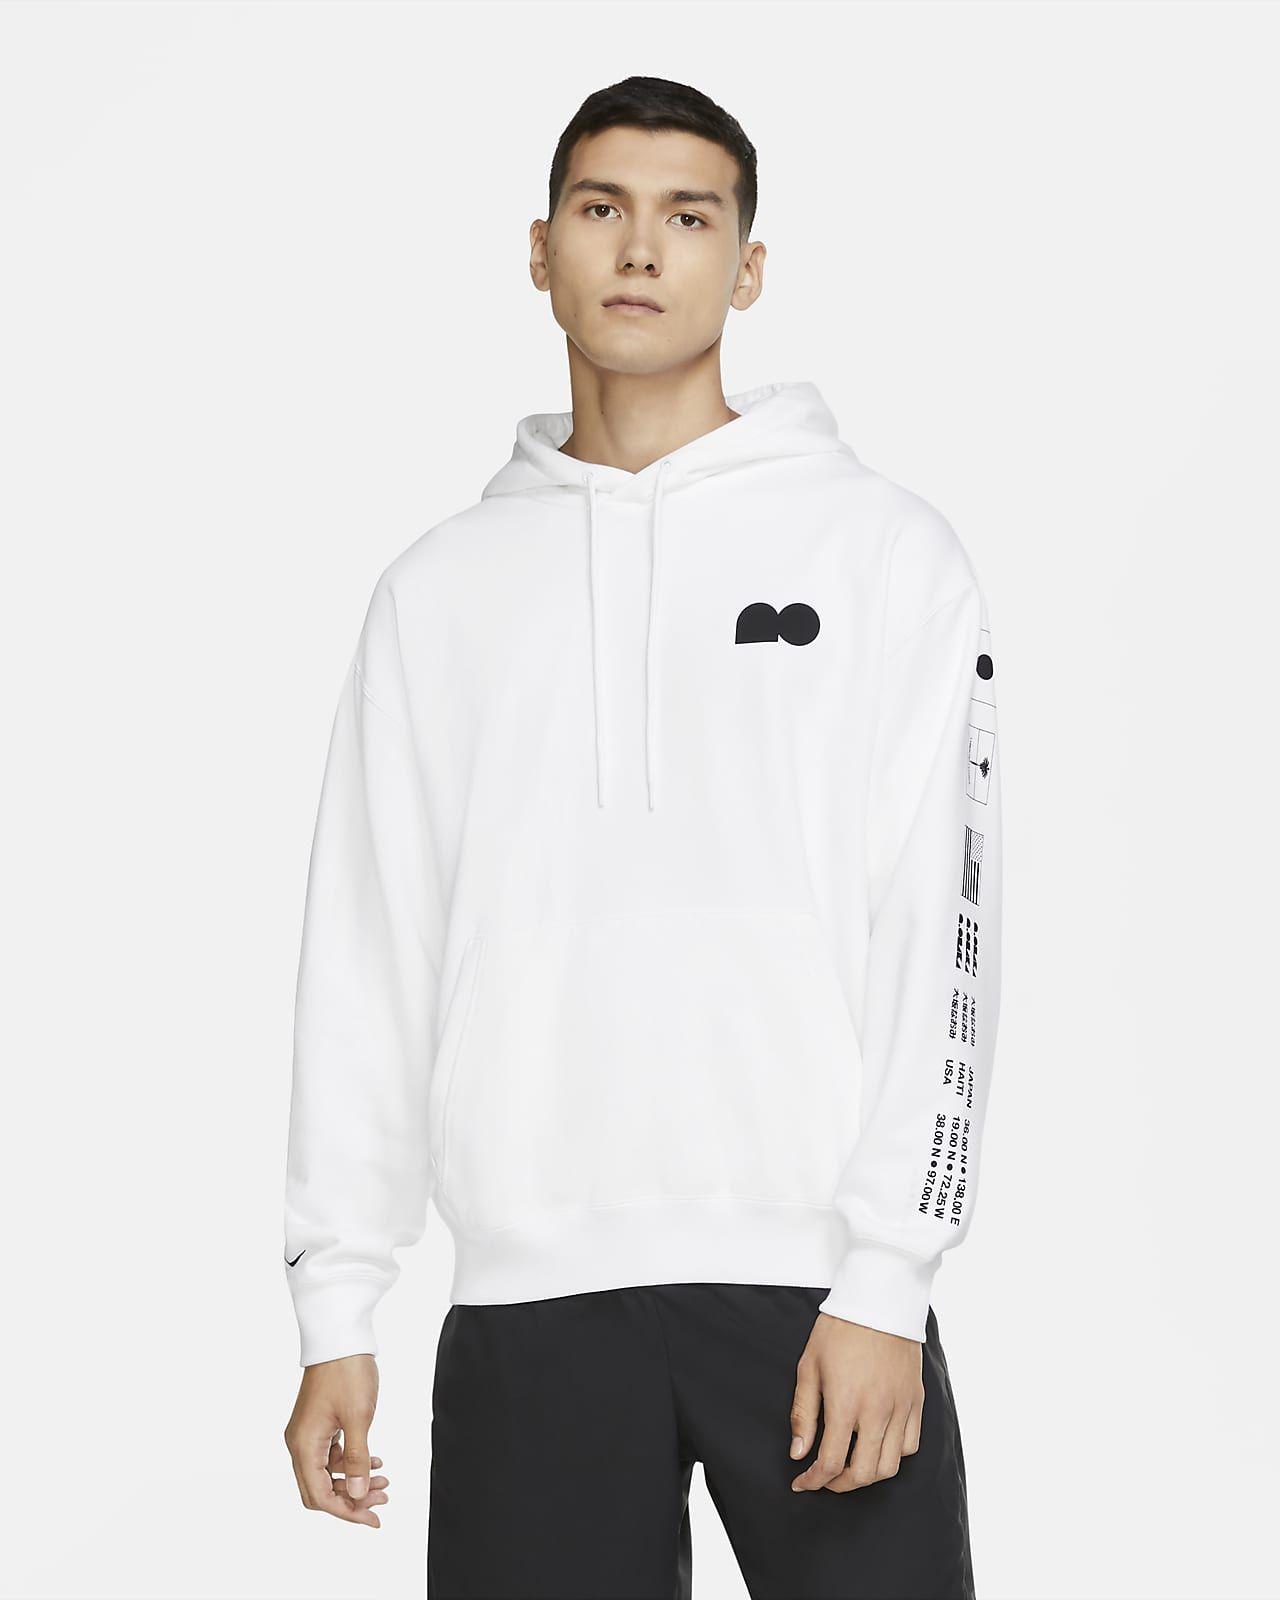 Naomi Osaka Pullover Tennis Hoodie Nike Com Hoodies Pullover Athletic Jacket [ 1600 x 1280 Pixel ]